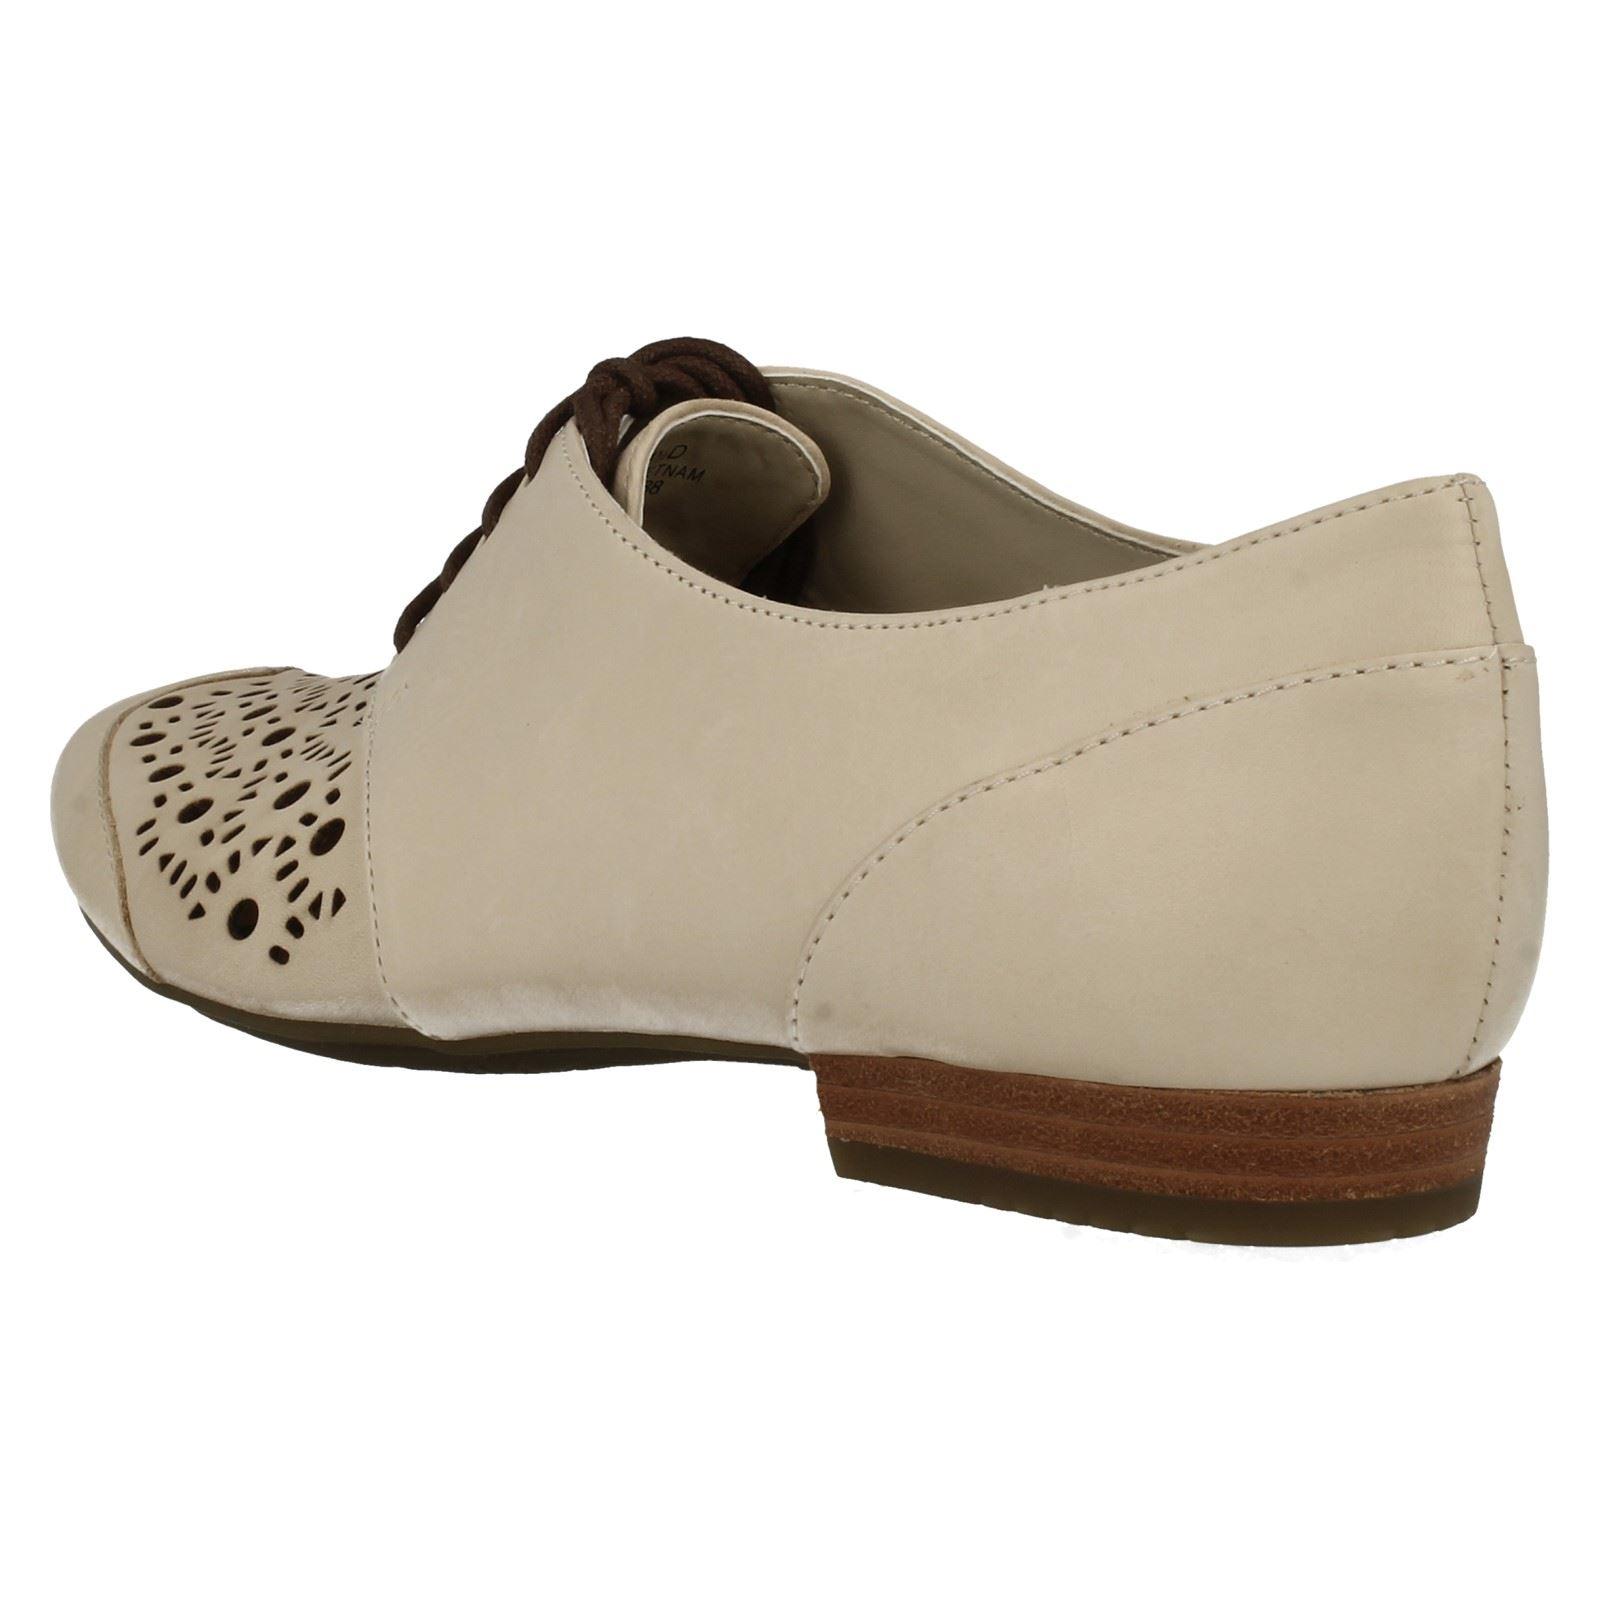 Details about Ladies Clarks Active Air Shoes Henderson Sky